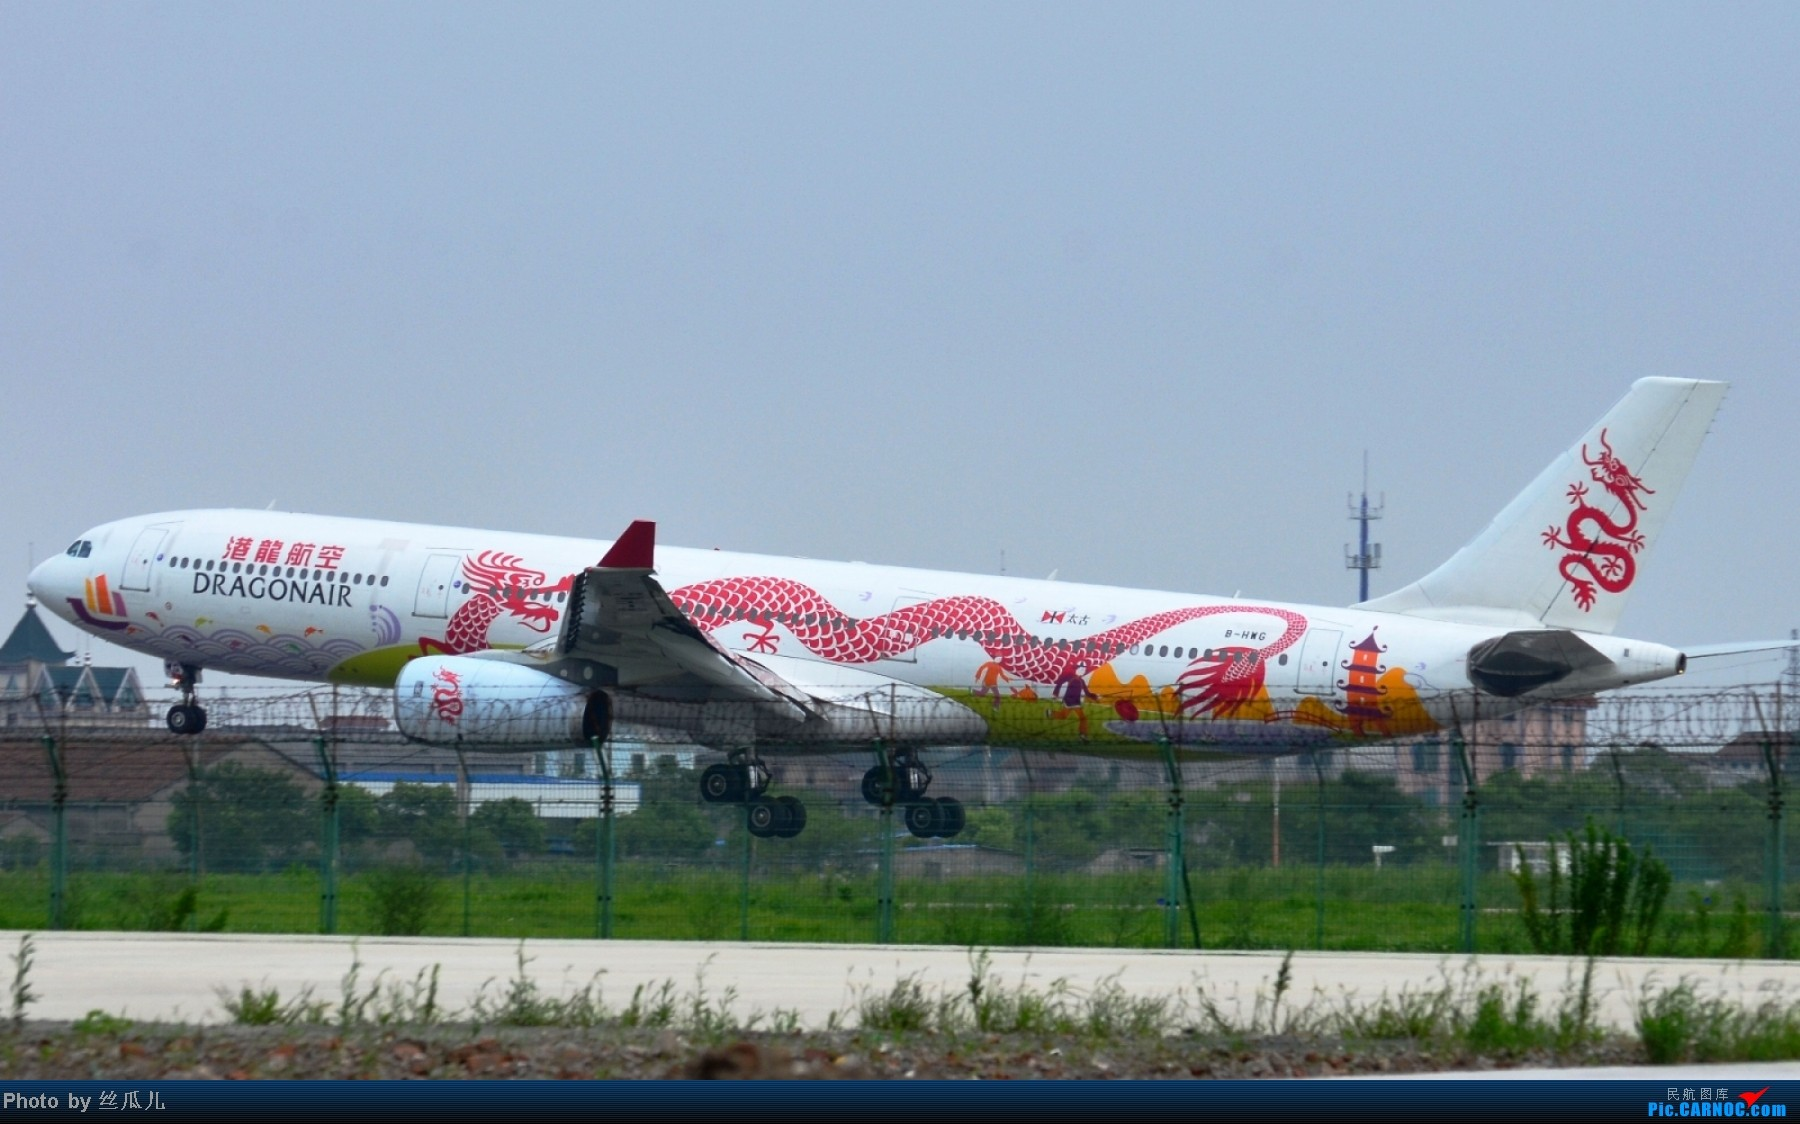 Re:[公告]HGH的游击队员们注意了,6号路阵地即将失守,附送港龙20周年彩妆机和铁丝网的亲密合影 AIRBUS A330-300 B-HWG 中国杭州萧山机场